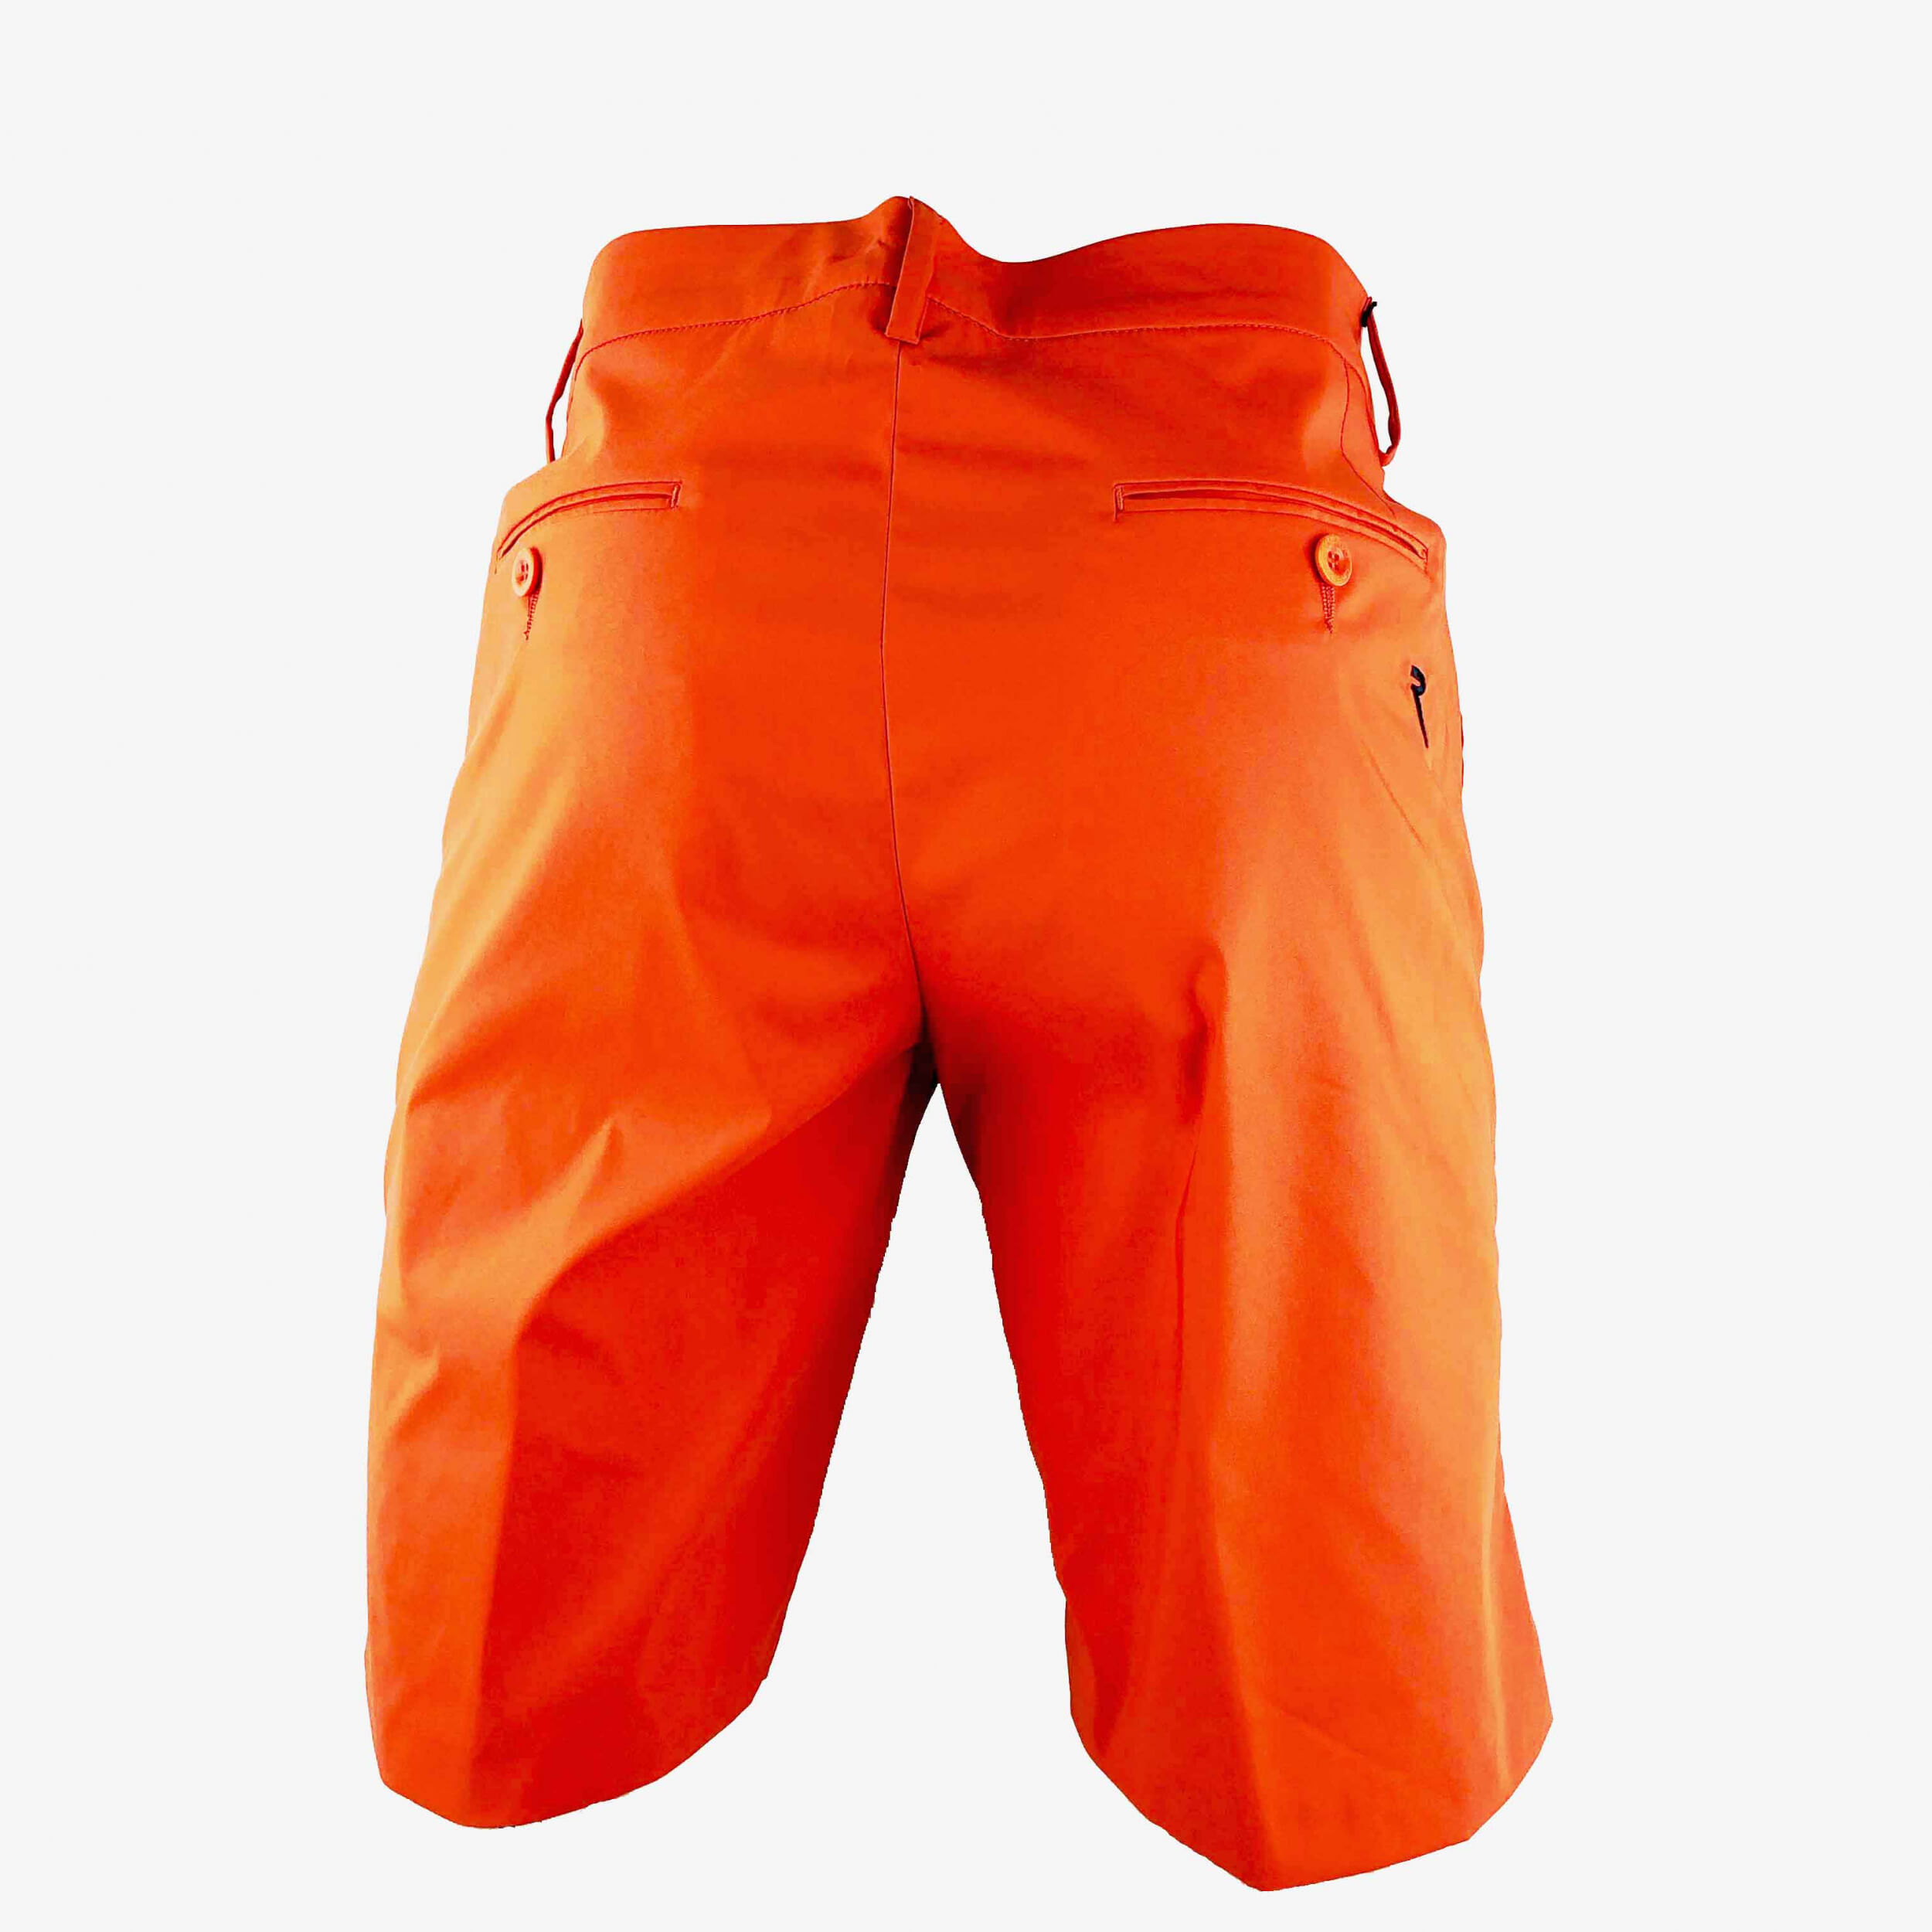 Chervo Herren Short Garcia DRY MATIC plasmatic 367 orange